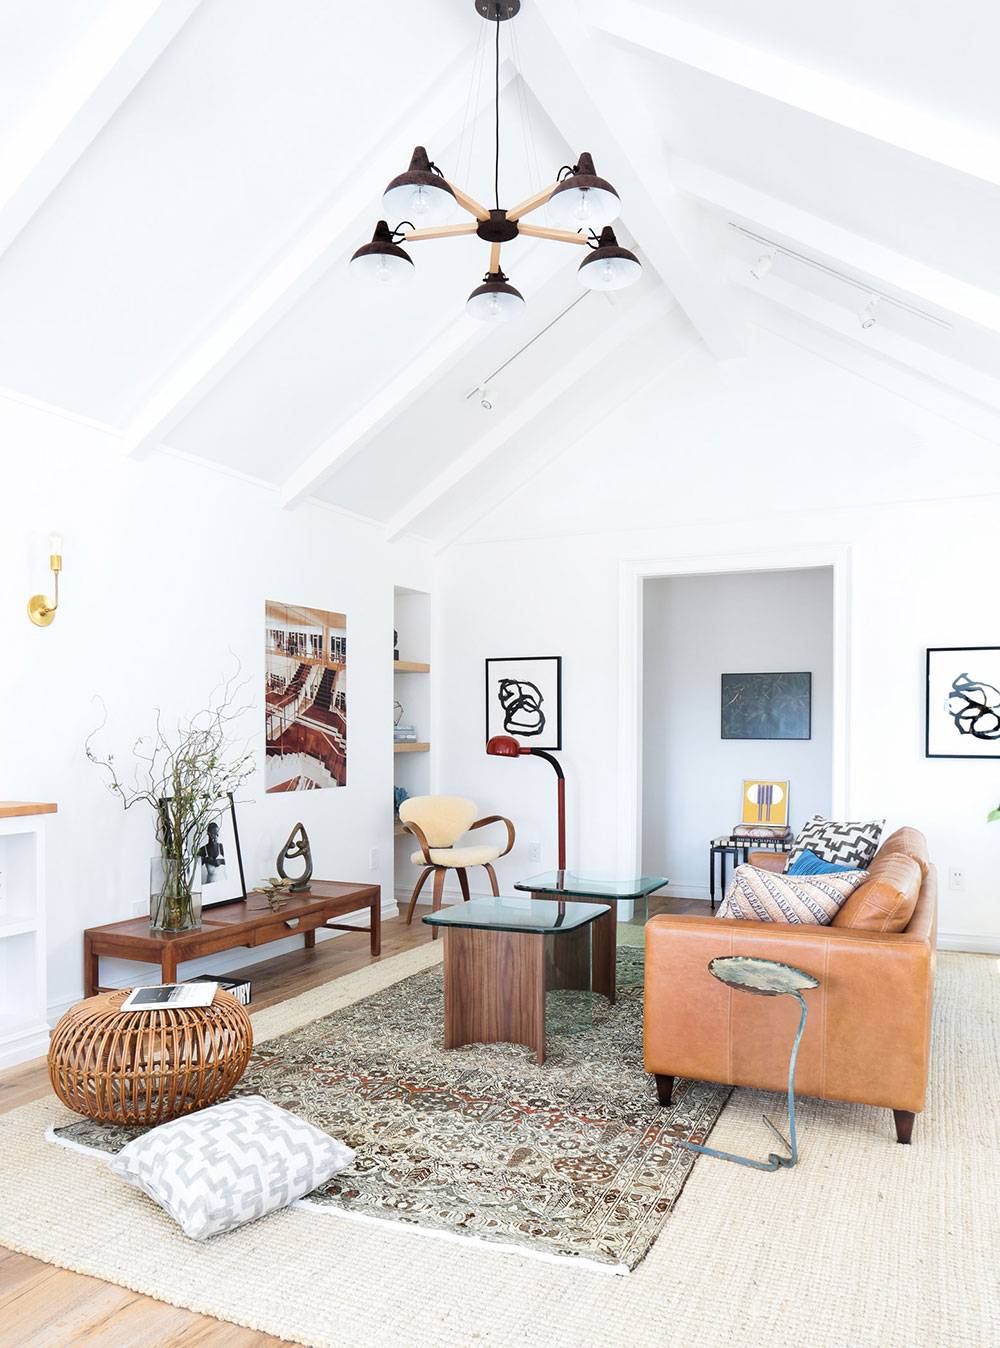 stefanistein-interior-design-remodel-renovation-architecture-interiors-livingroom-vaultedceiling-modern-leather